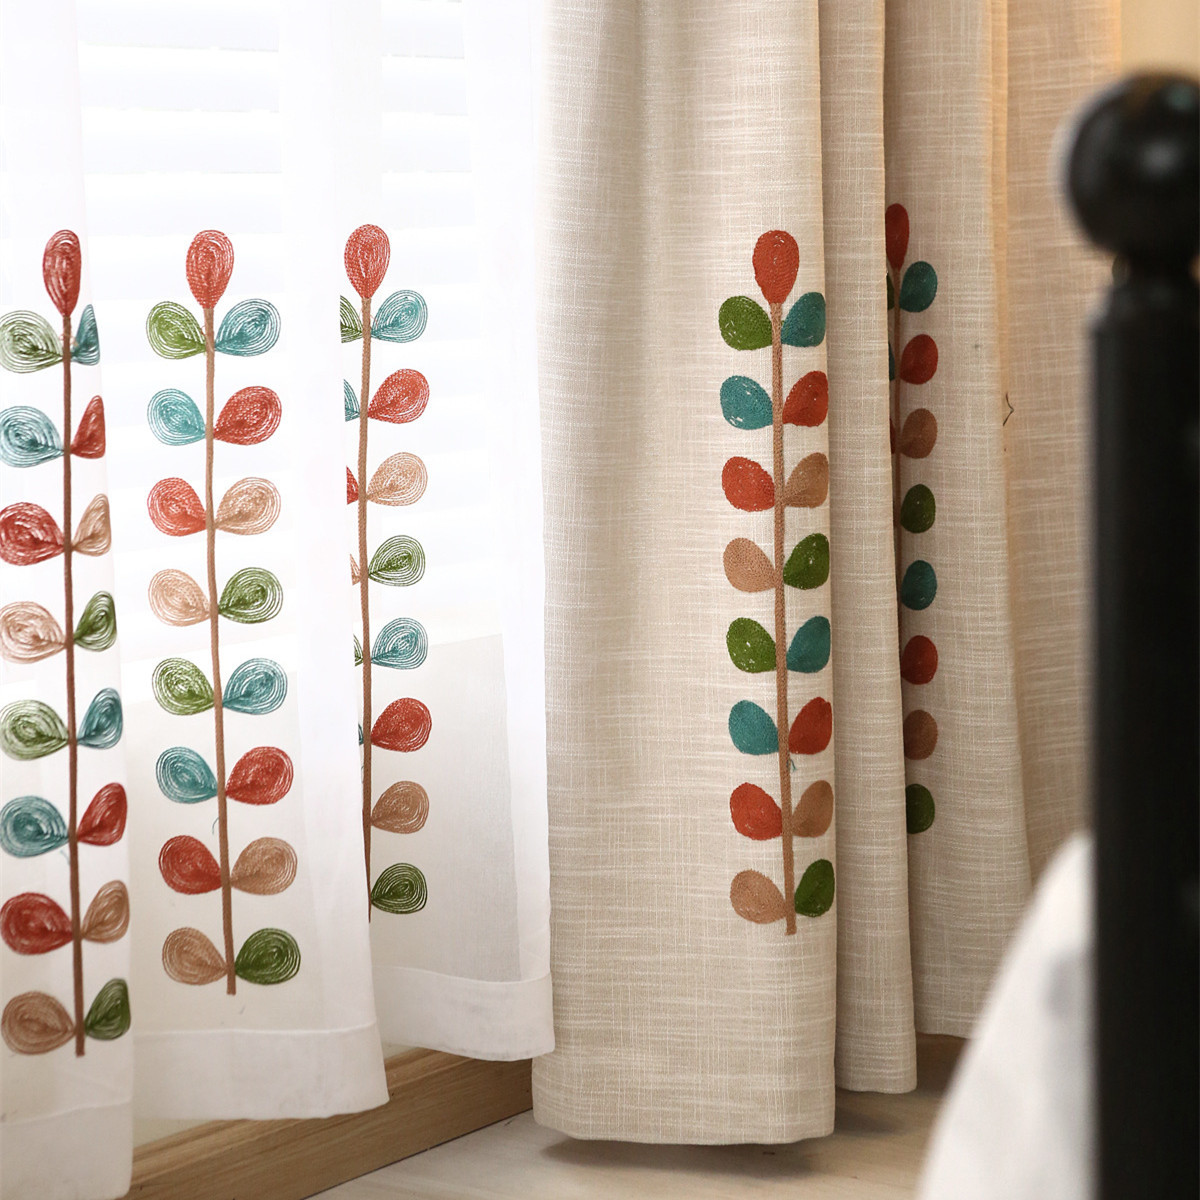 lino bordado - compra lotes baratos de lino bordado de china